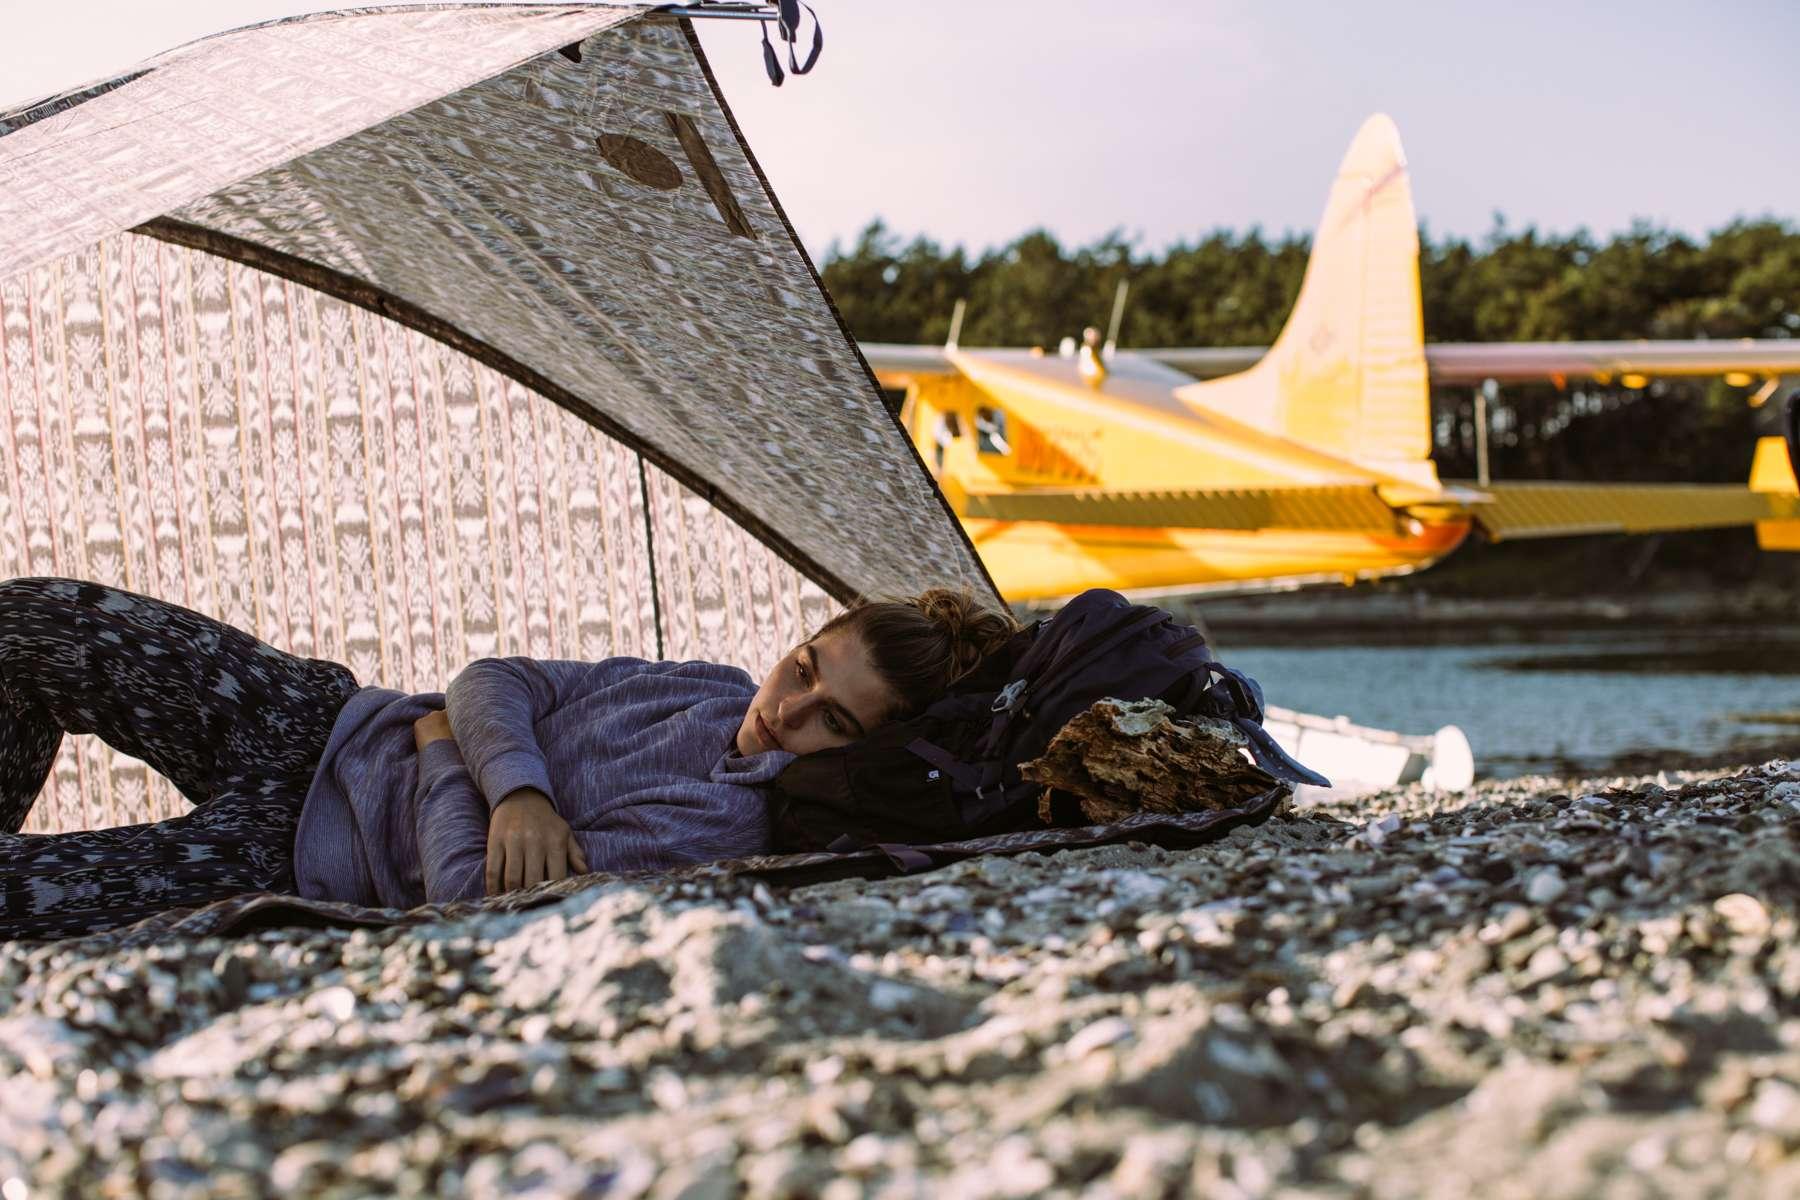 Tavia, Tent napping